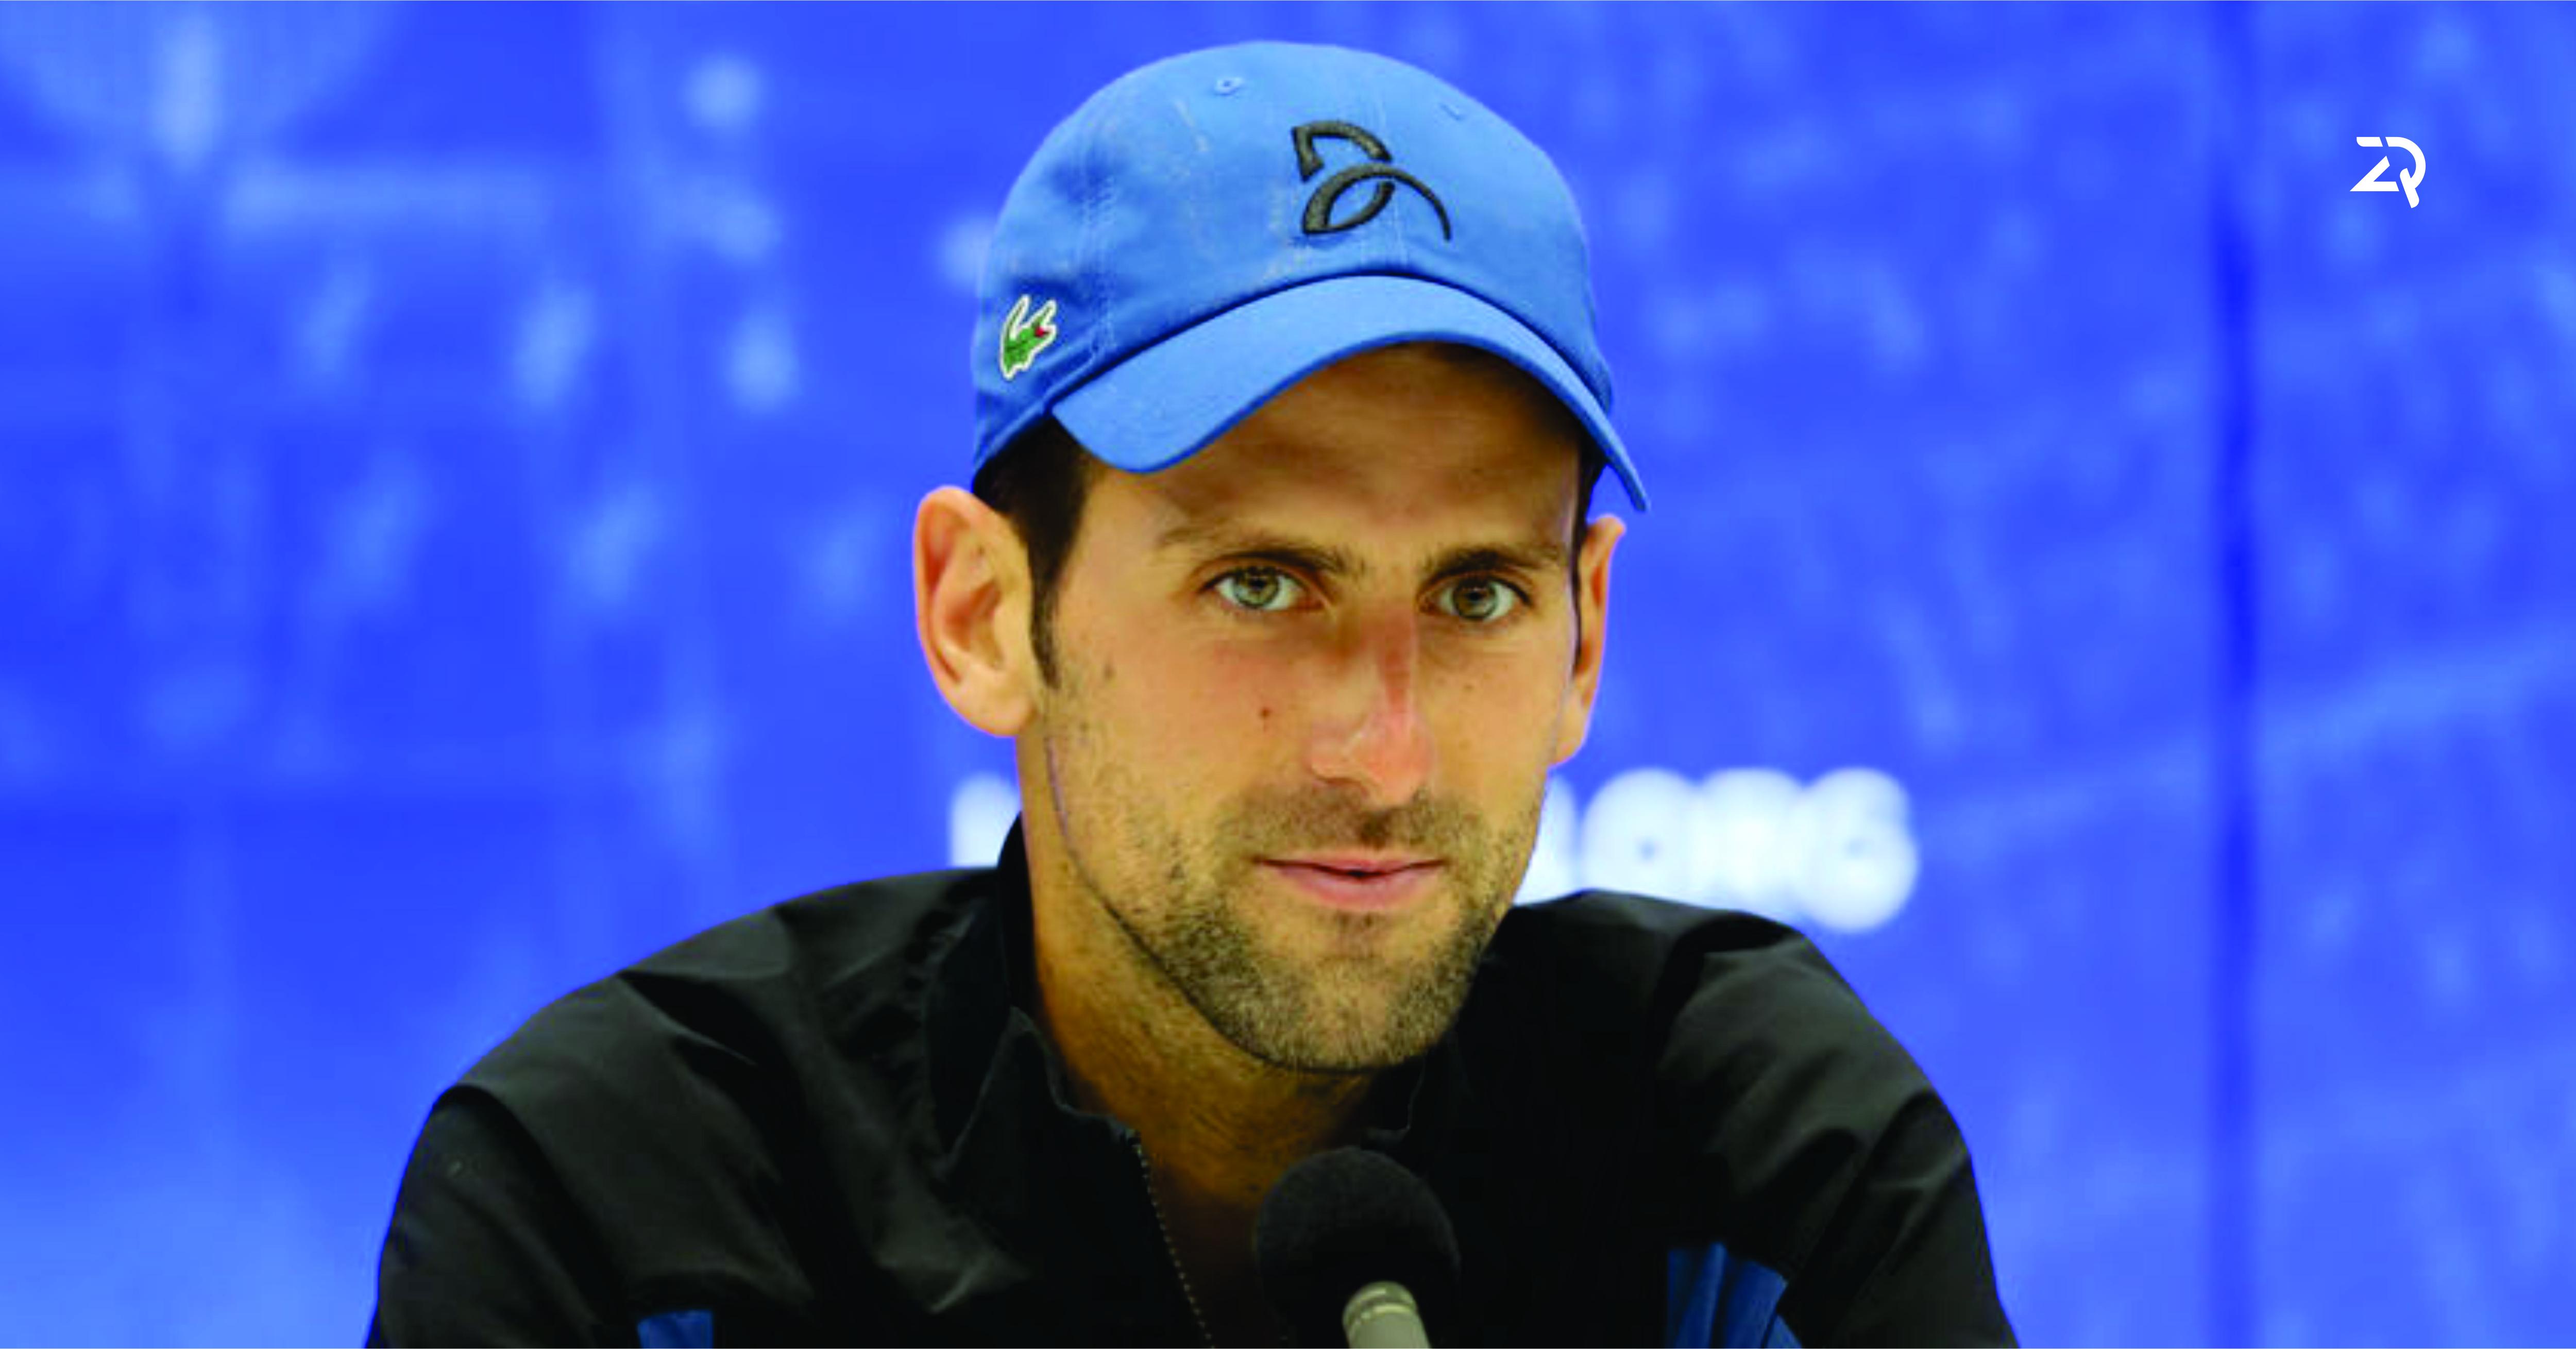 What is Novak Djokovic doing in Bosnia?